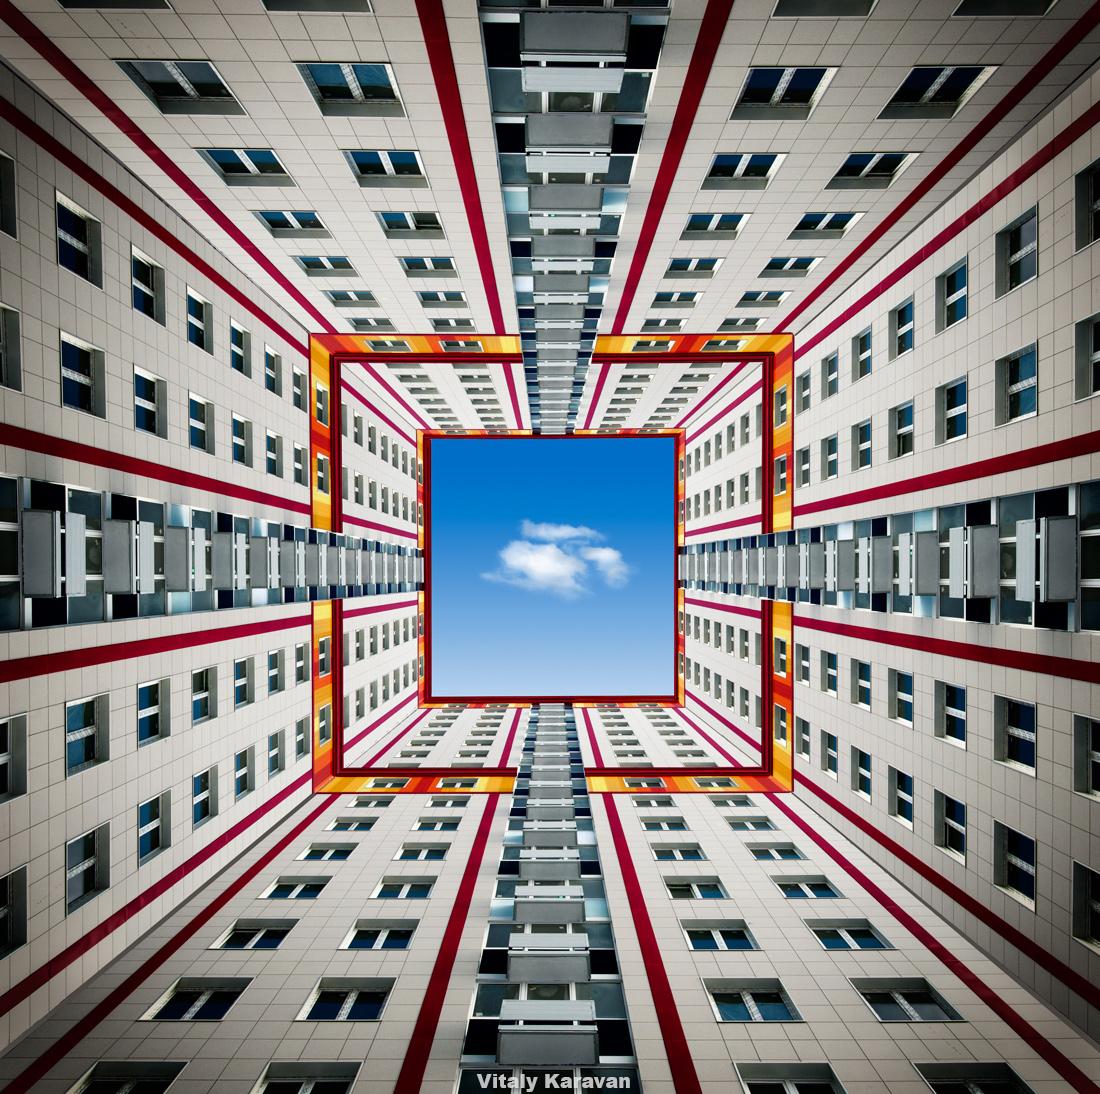 Квадрат Екатеринбург фото Виталий Караван